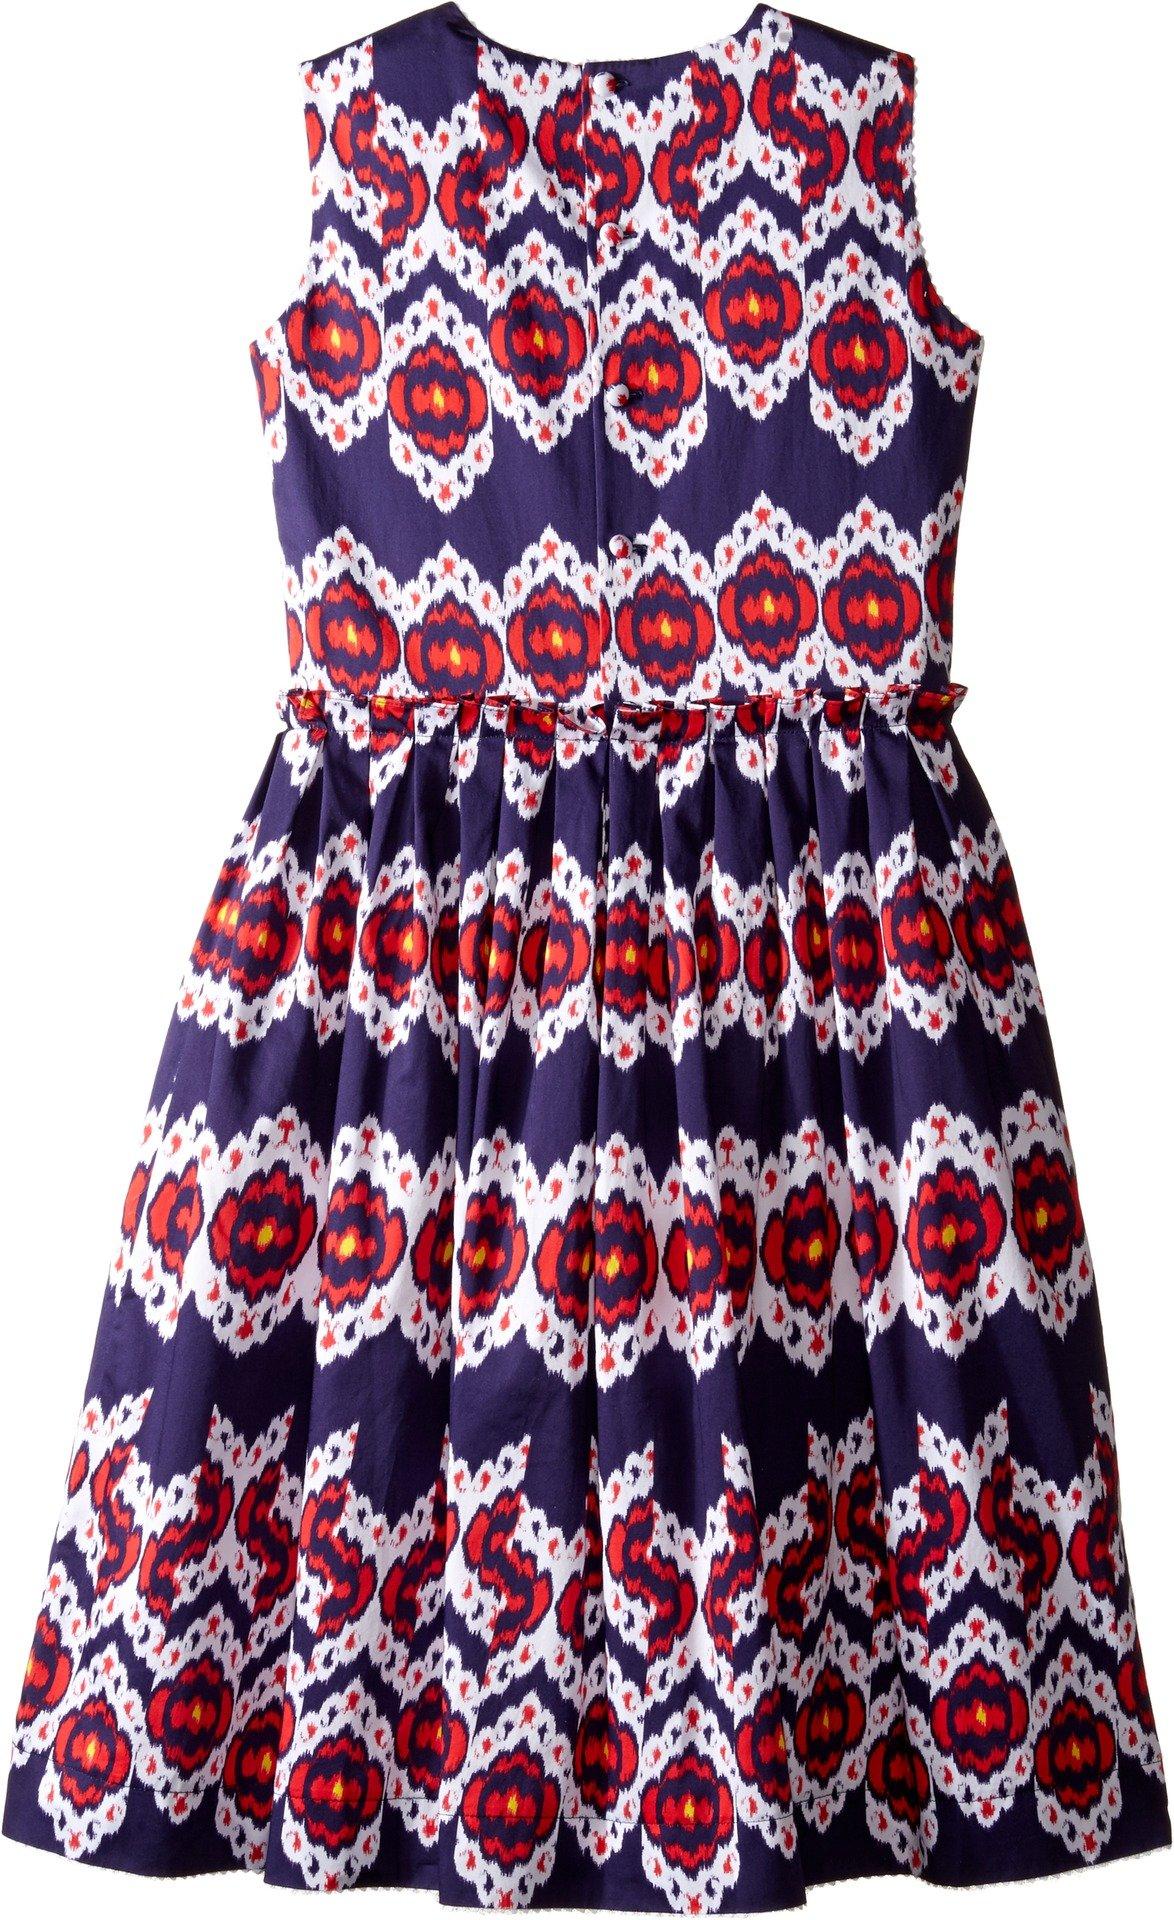 Oscar de la Renta Childrenswear Baby Girl's Ikat Cotton Gathered Skirt Party Dress (Toddler/Little Kids/Big Kids) Navy/Cherry Dress by Oscar de la Renta (Image #2)